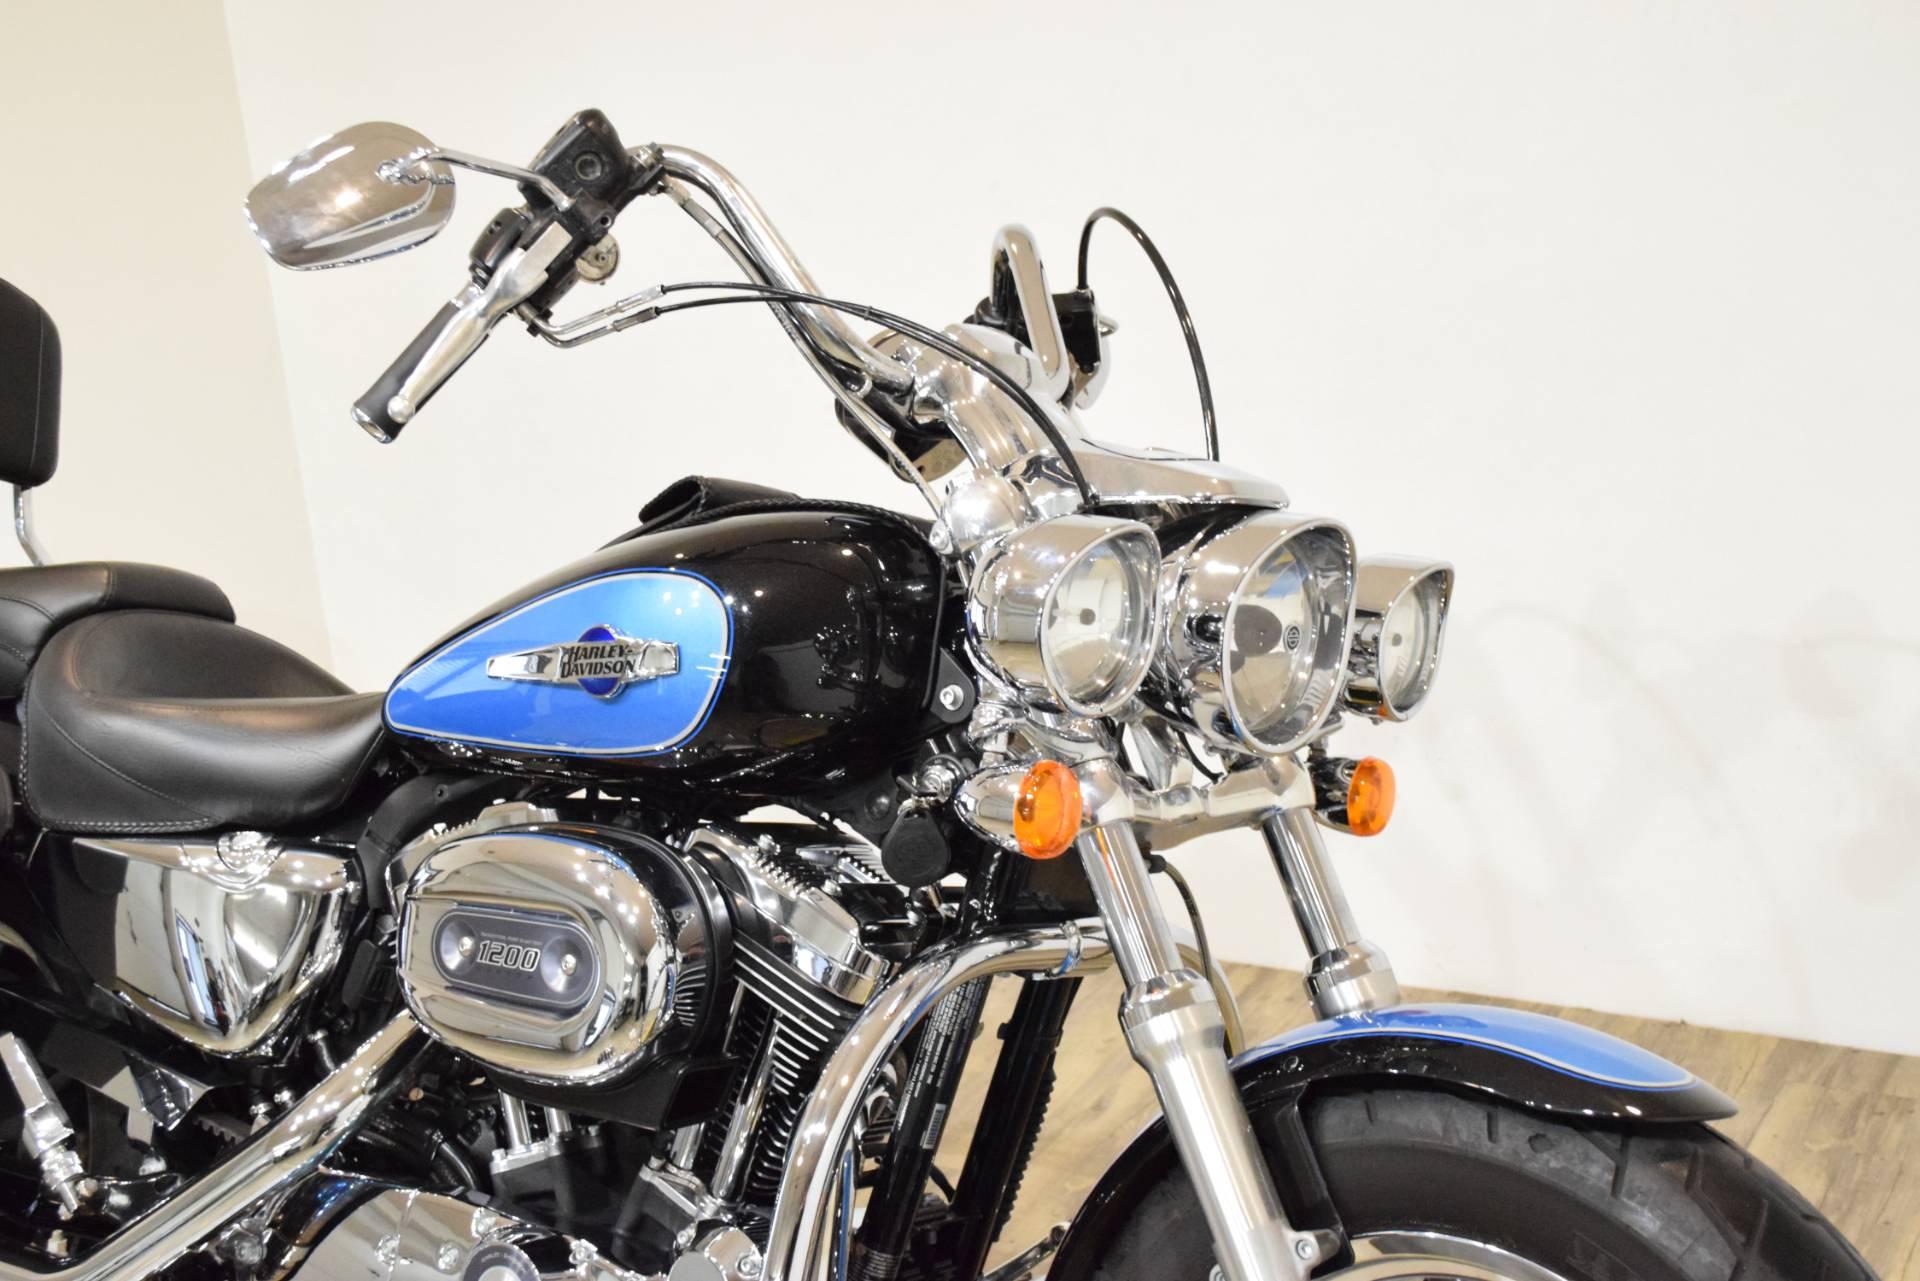 2012 Harley-Davidson XL1200C 3